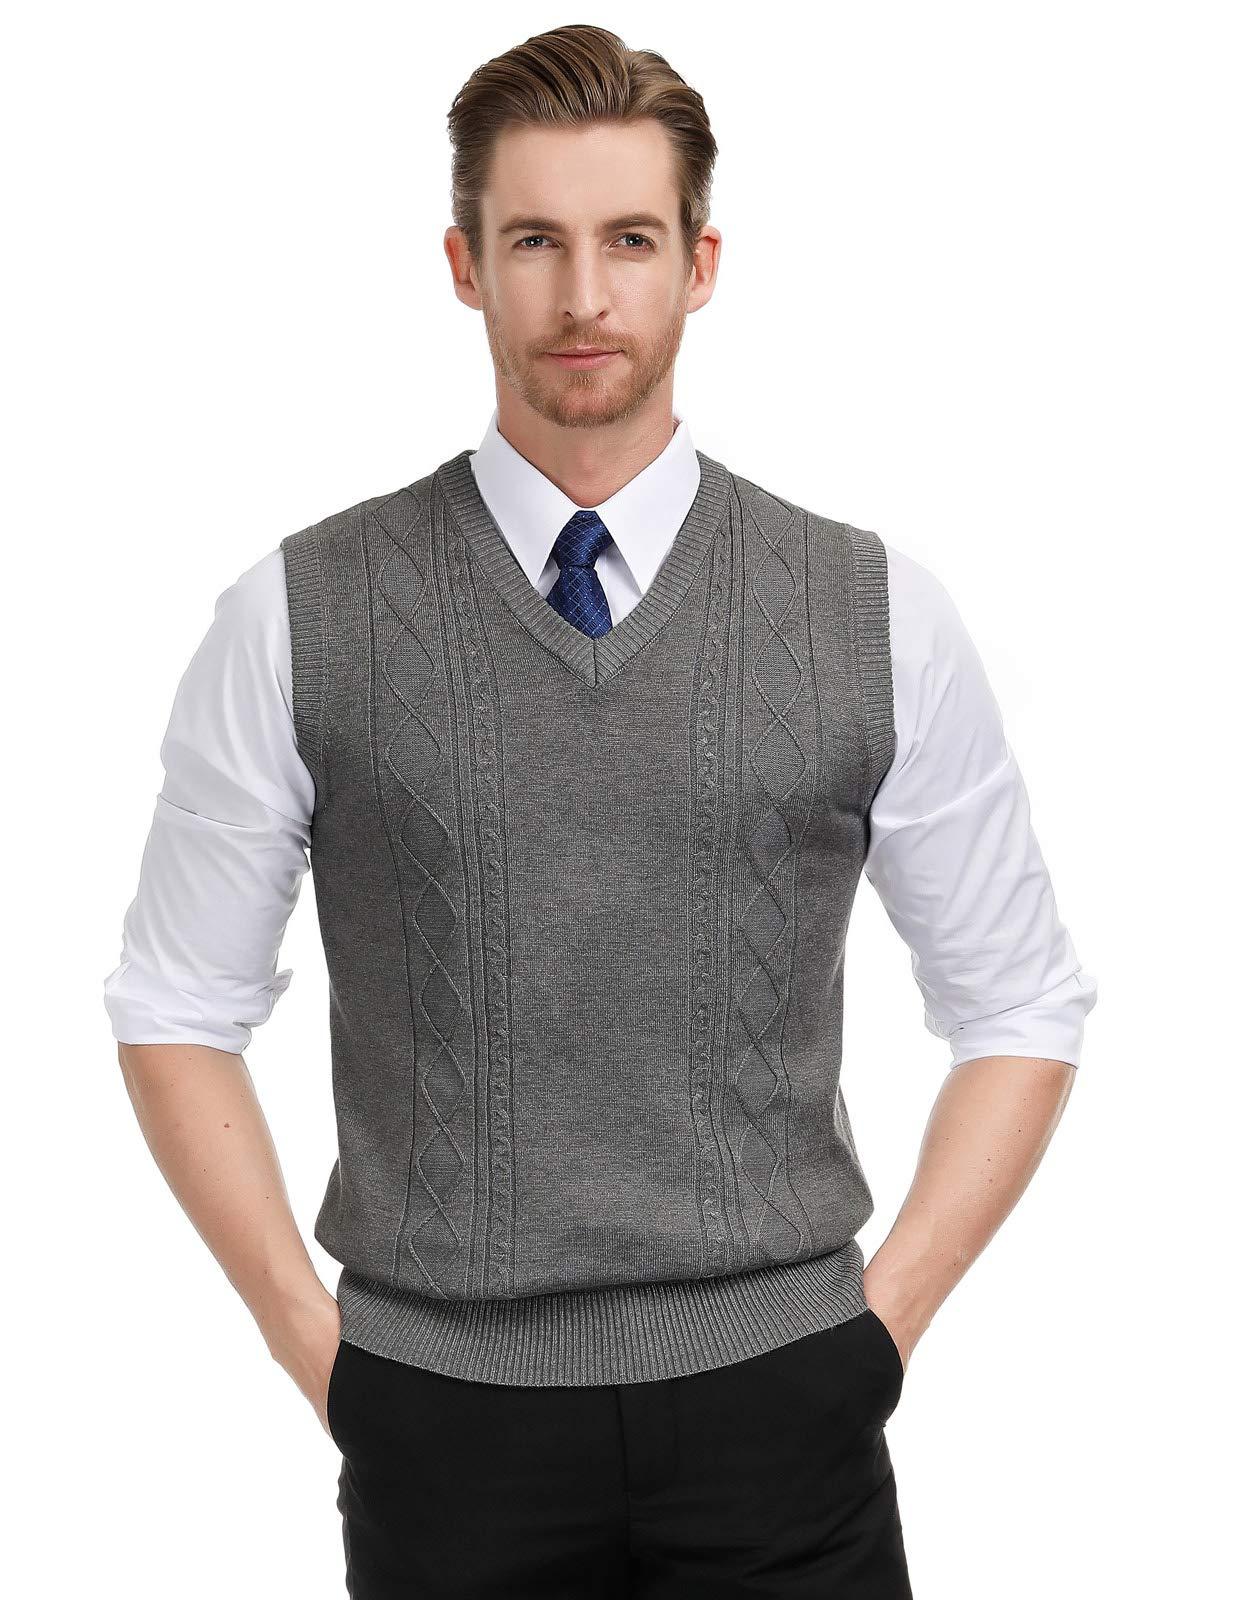 PAUL JONES Men's V-Neck Knitting Vest Sleeveless Pullover Sweater XL Dark Grey by PAUL JONES